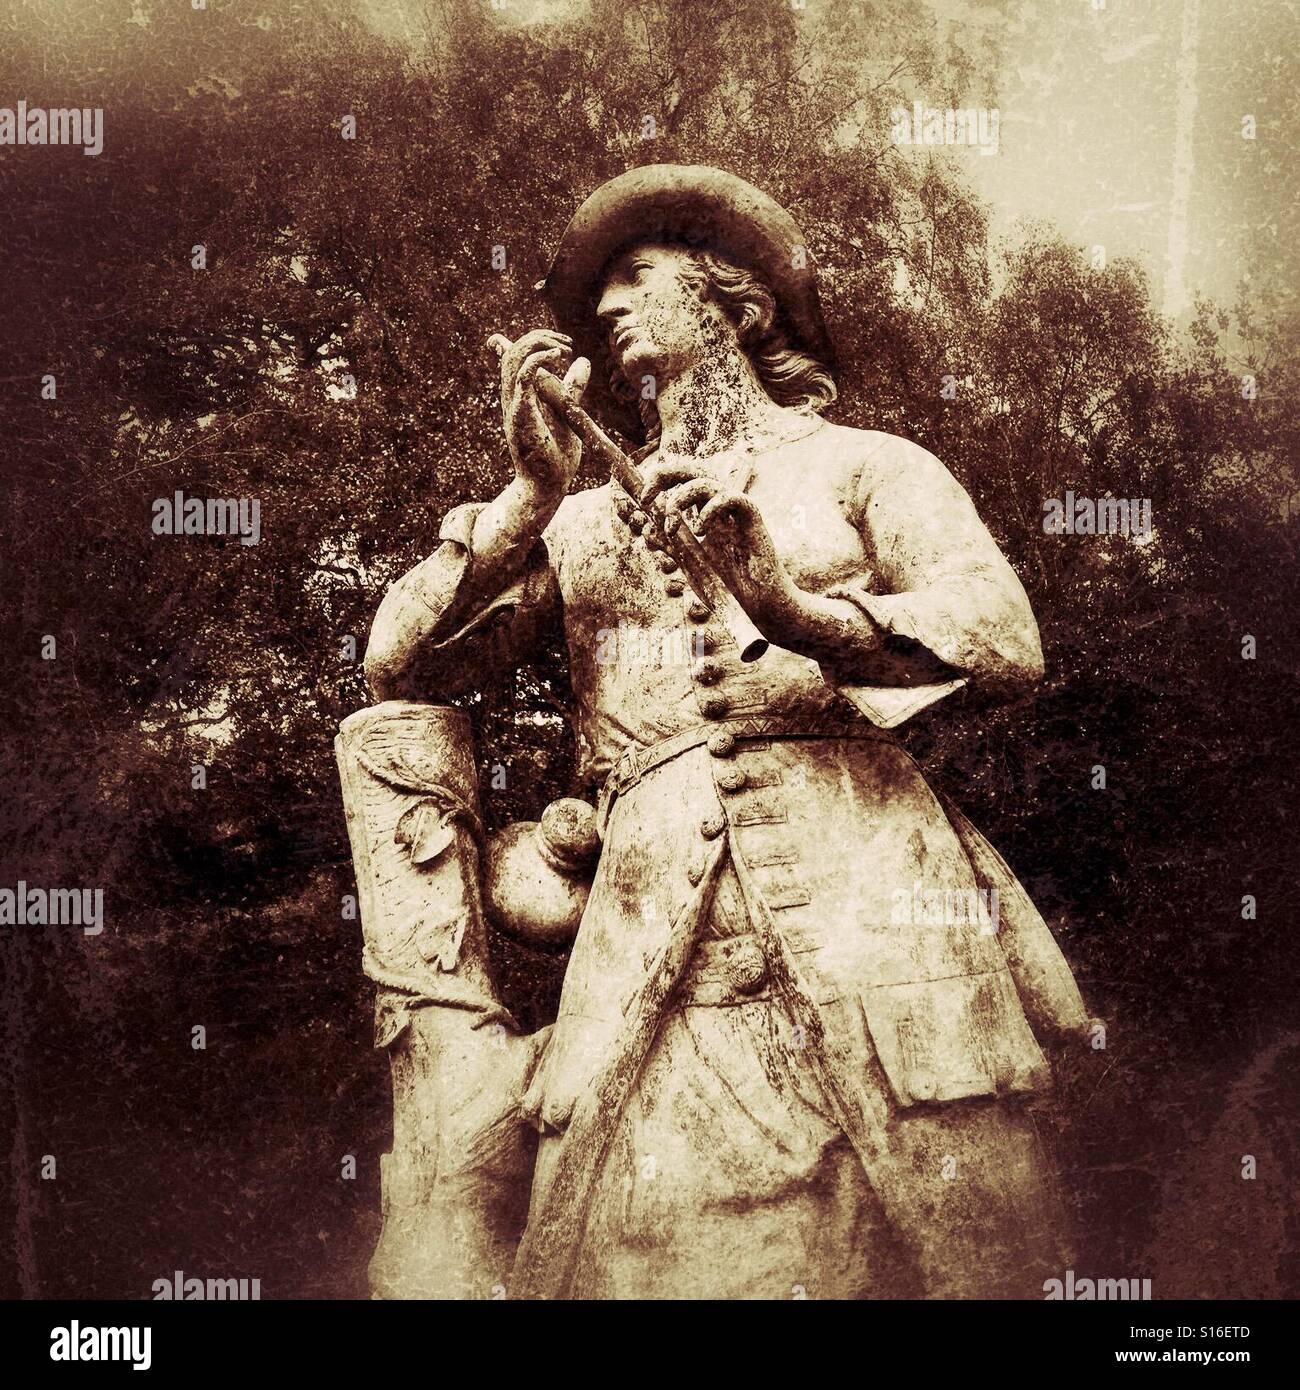 Nostalgic statue of a shepherd boy holding a pipe, in sepia tones Stock Photo